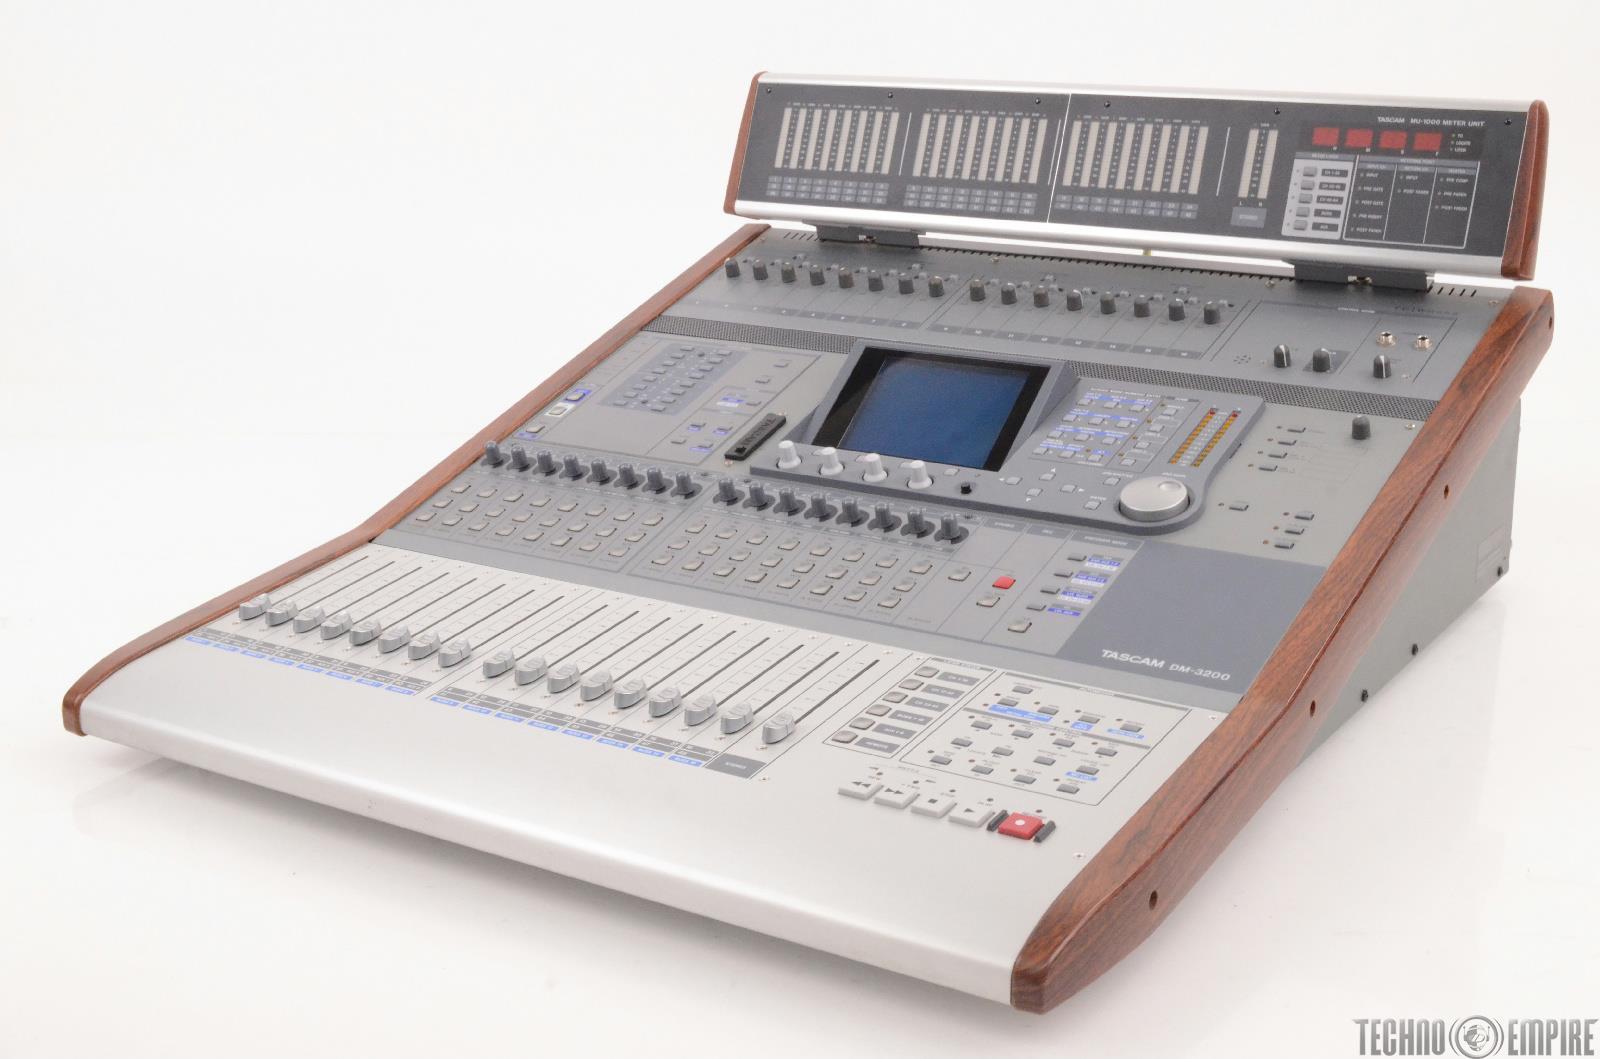 tascam dm 3200 24 bit 96 khz digital mixing console w meter bridge 24144 ebay. Black Bedroom Furniture Sets. Home Design Ideas